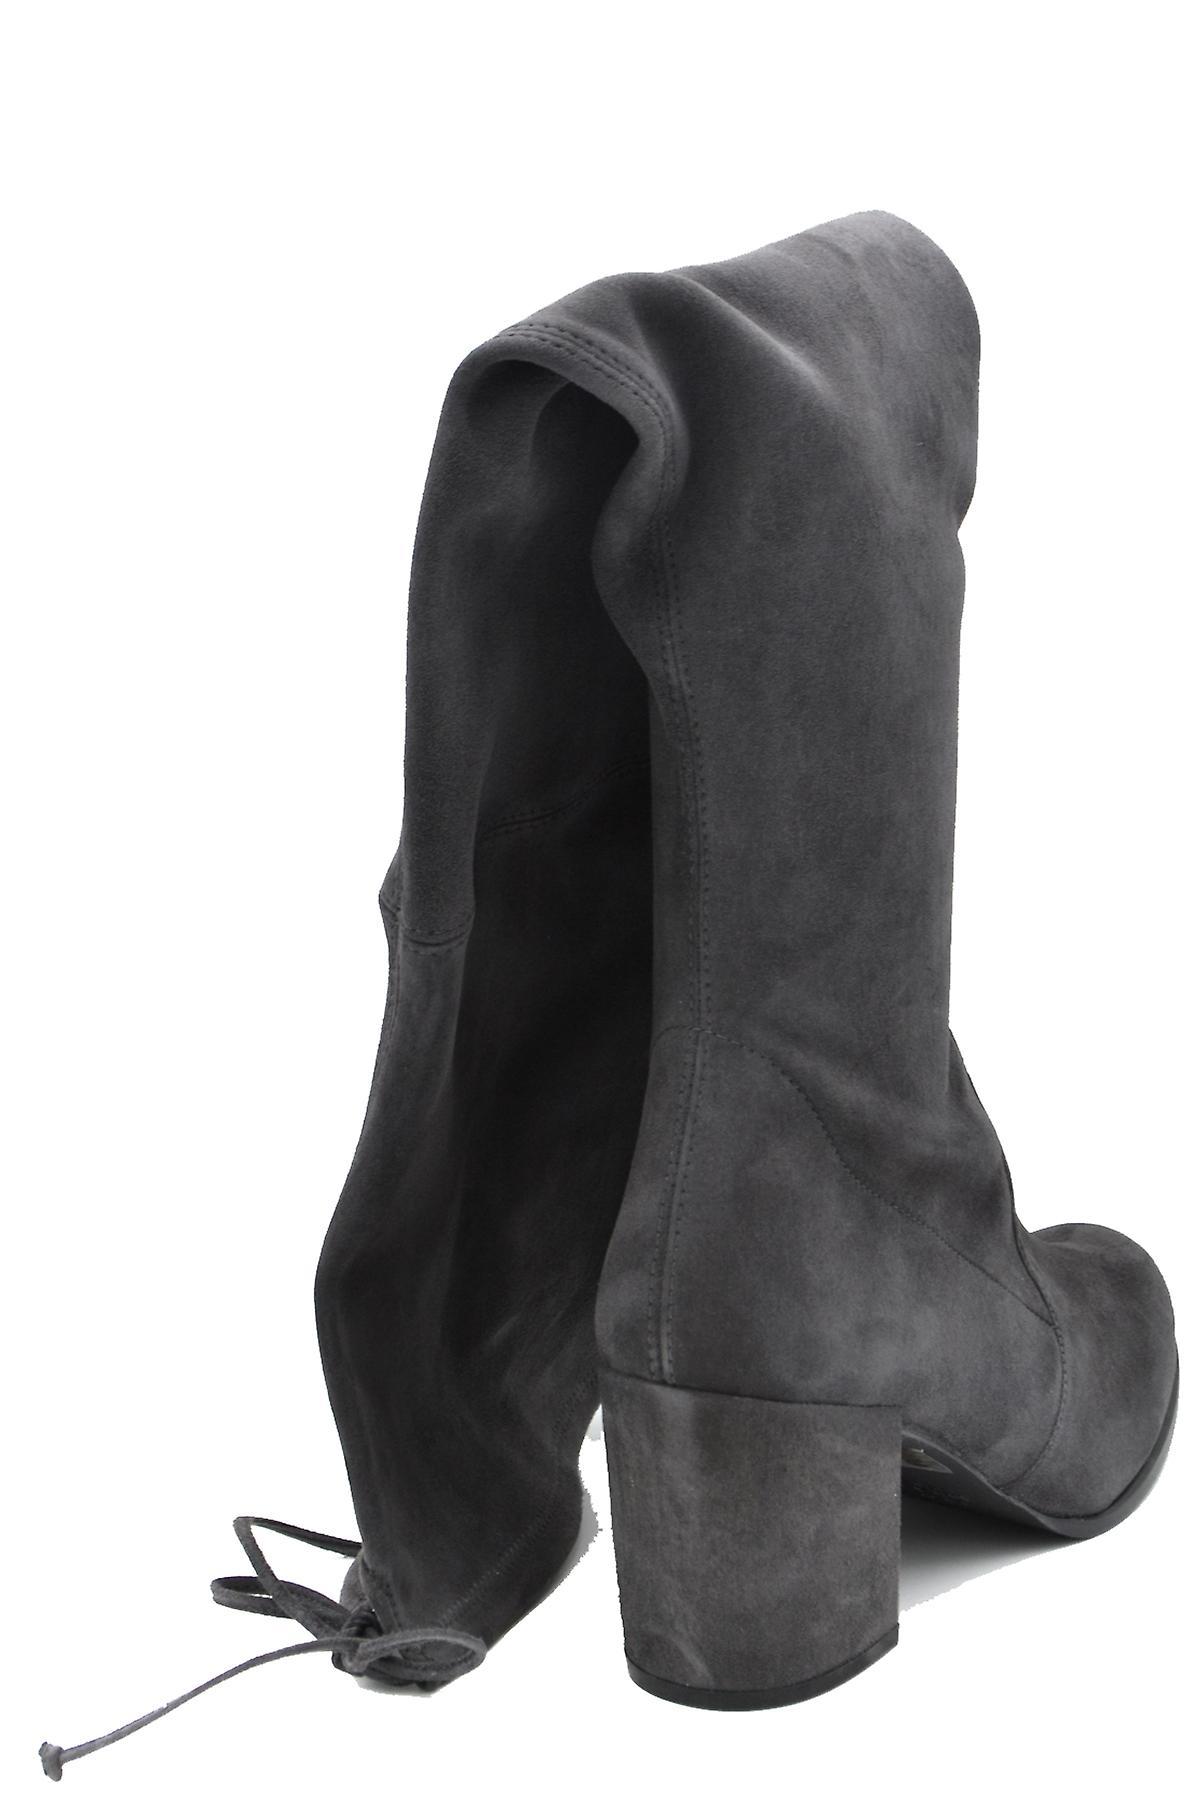 Stuart Weitzman Ezbc158014 Women's Grey Suede Boots